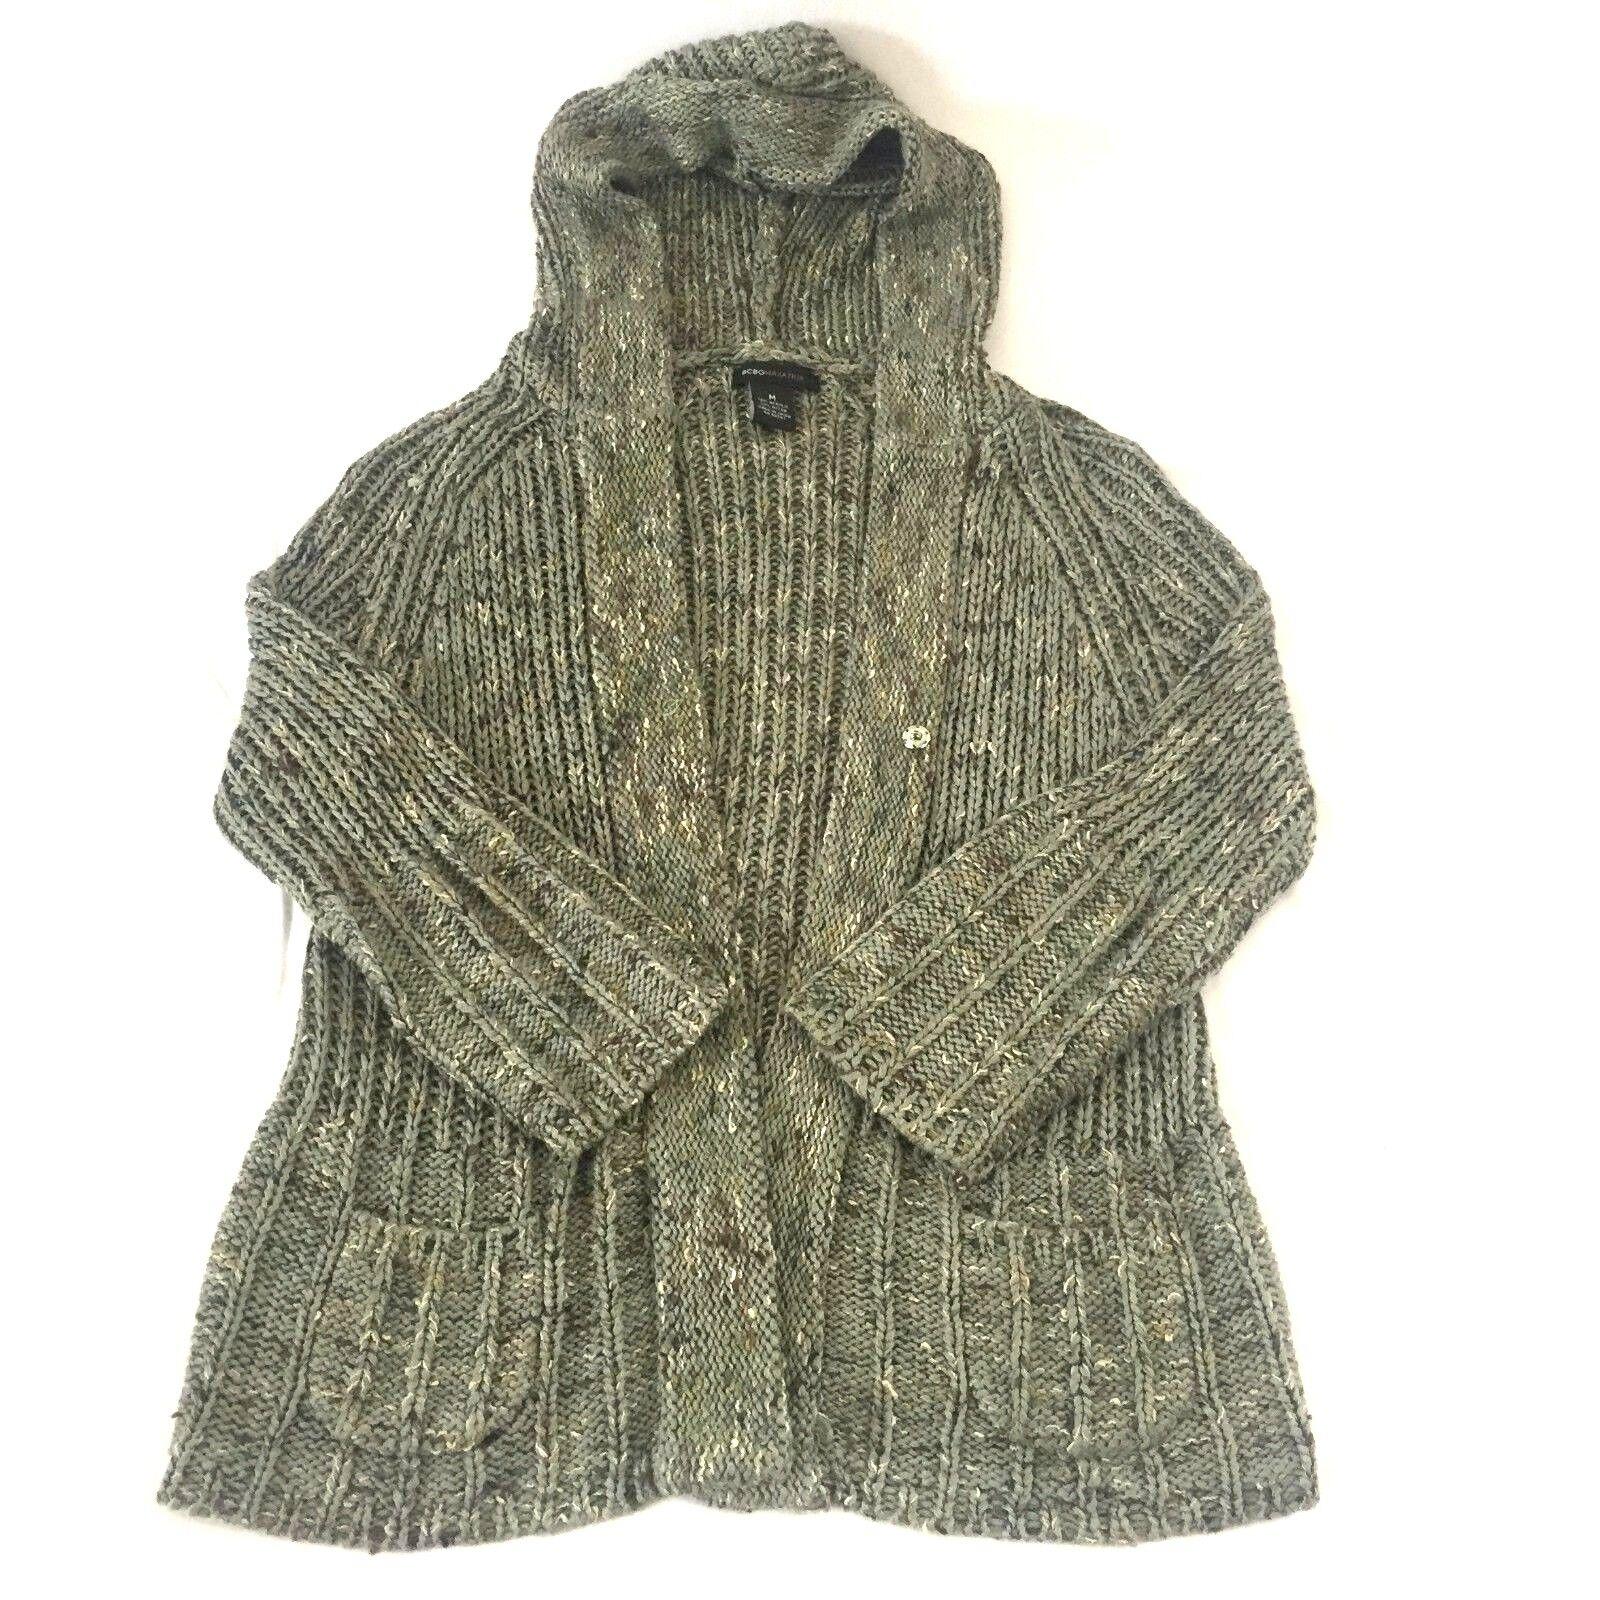 BCBG Maxazria Women's M Hoodie Green Knit Cardigan